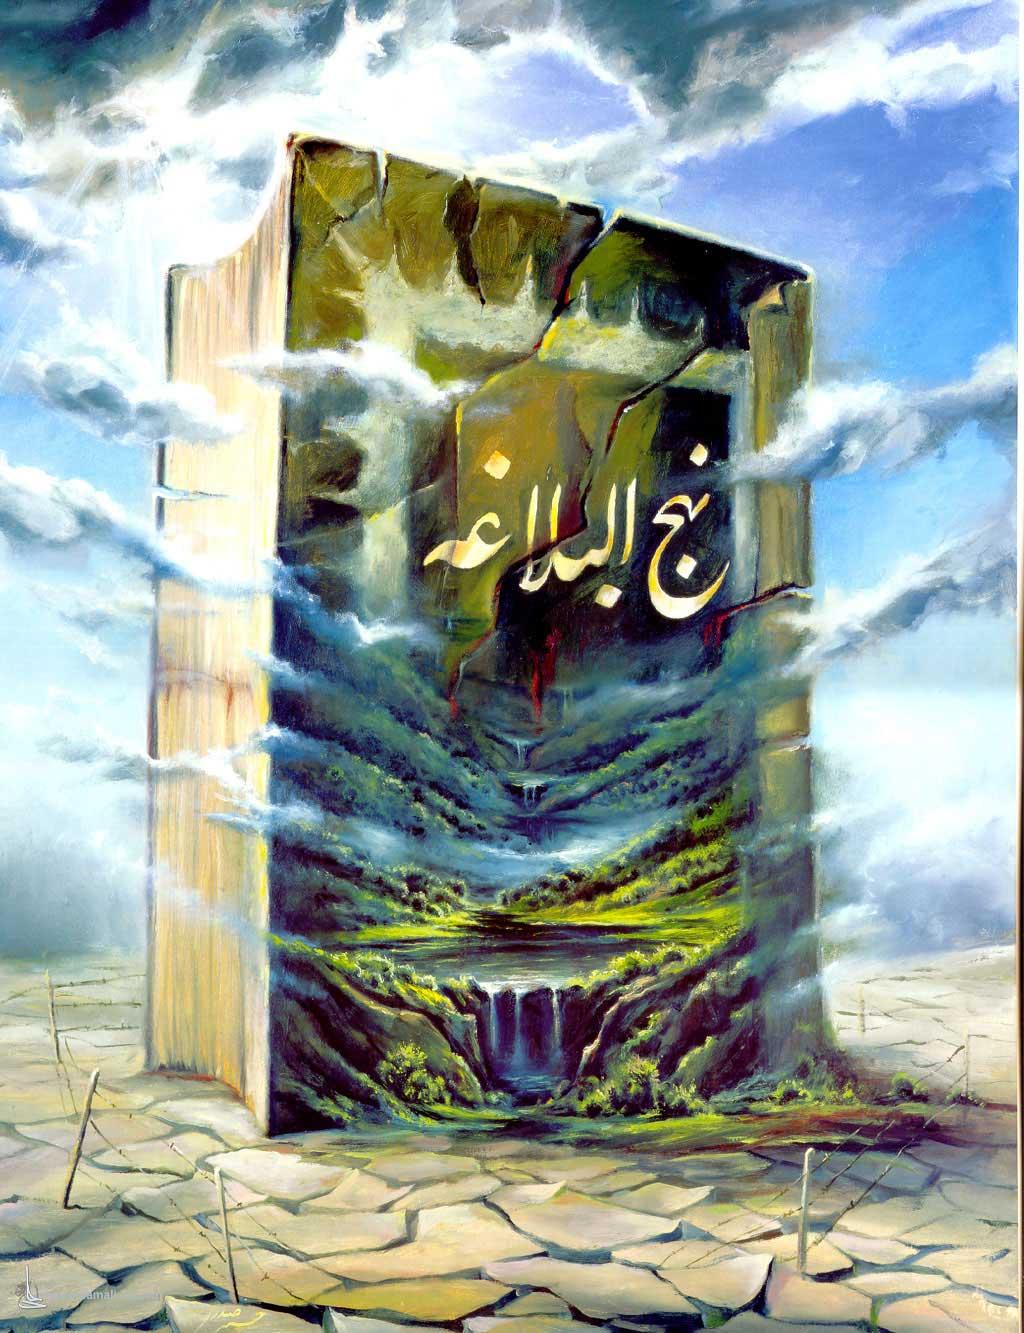 نهج البلاغه(خطبه31الی60) سیر ارتجاعی امّت اسلامی